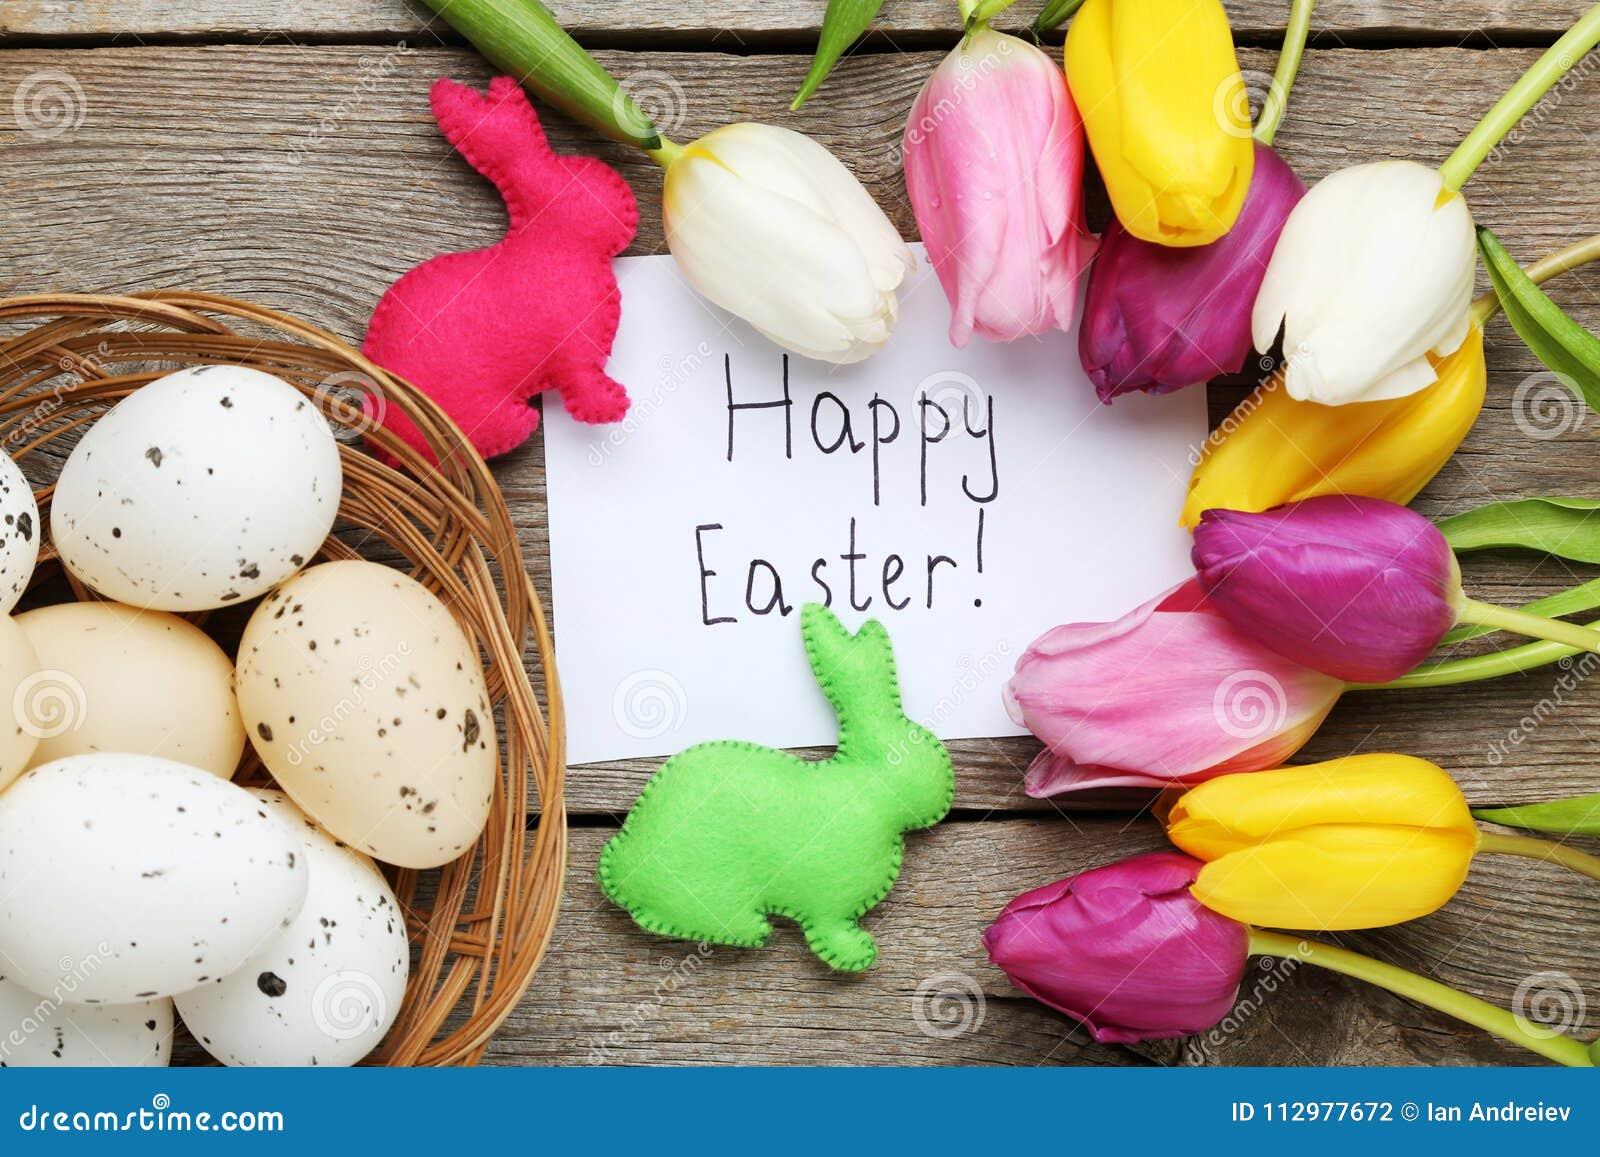 Inscription Happy Easter